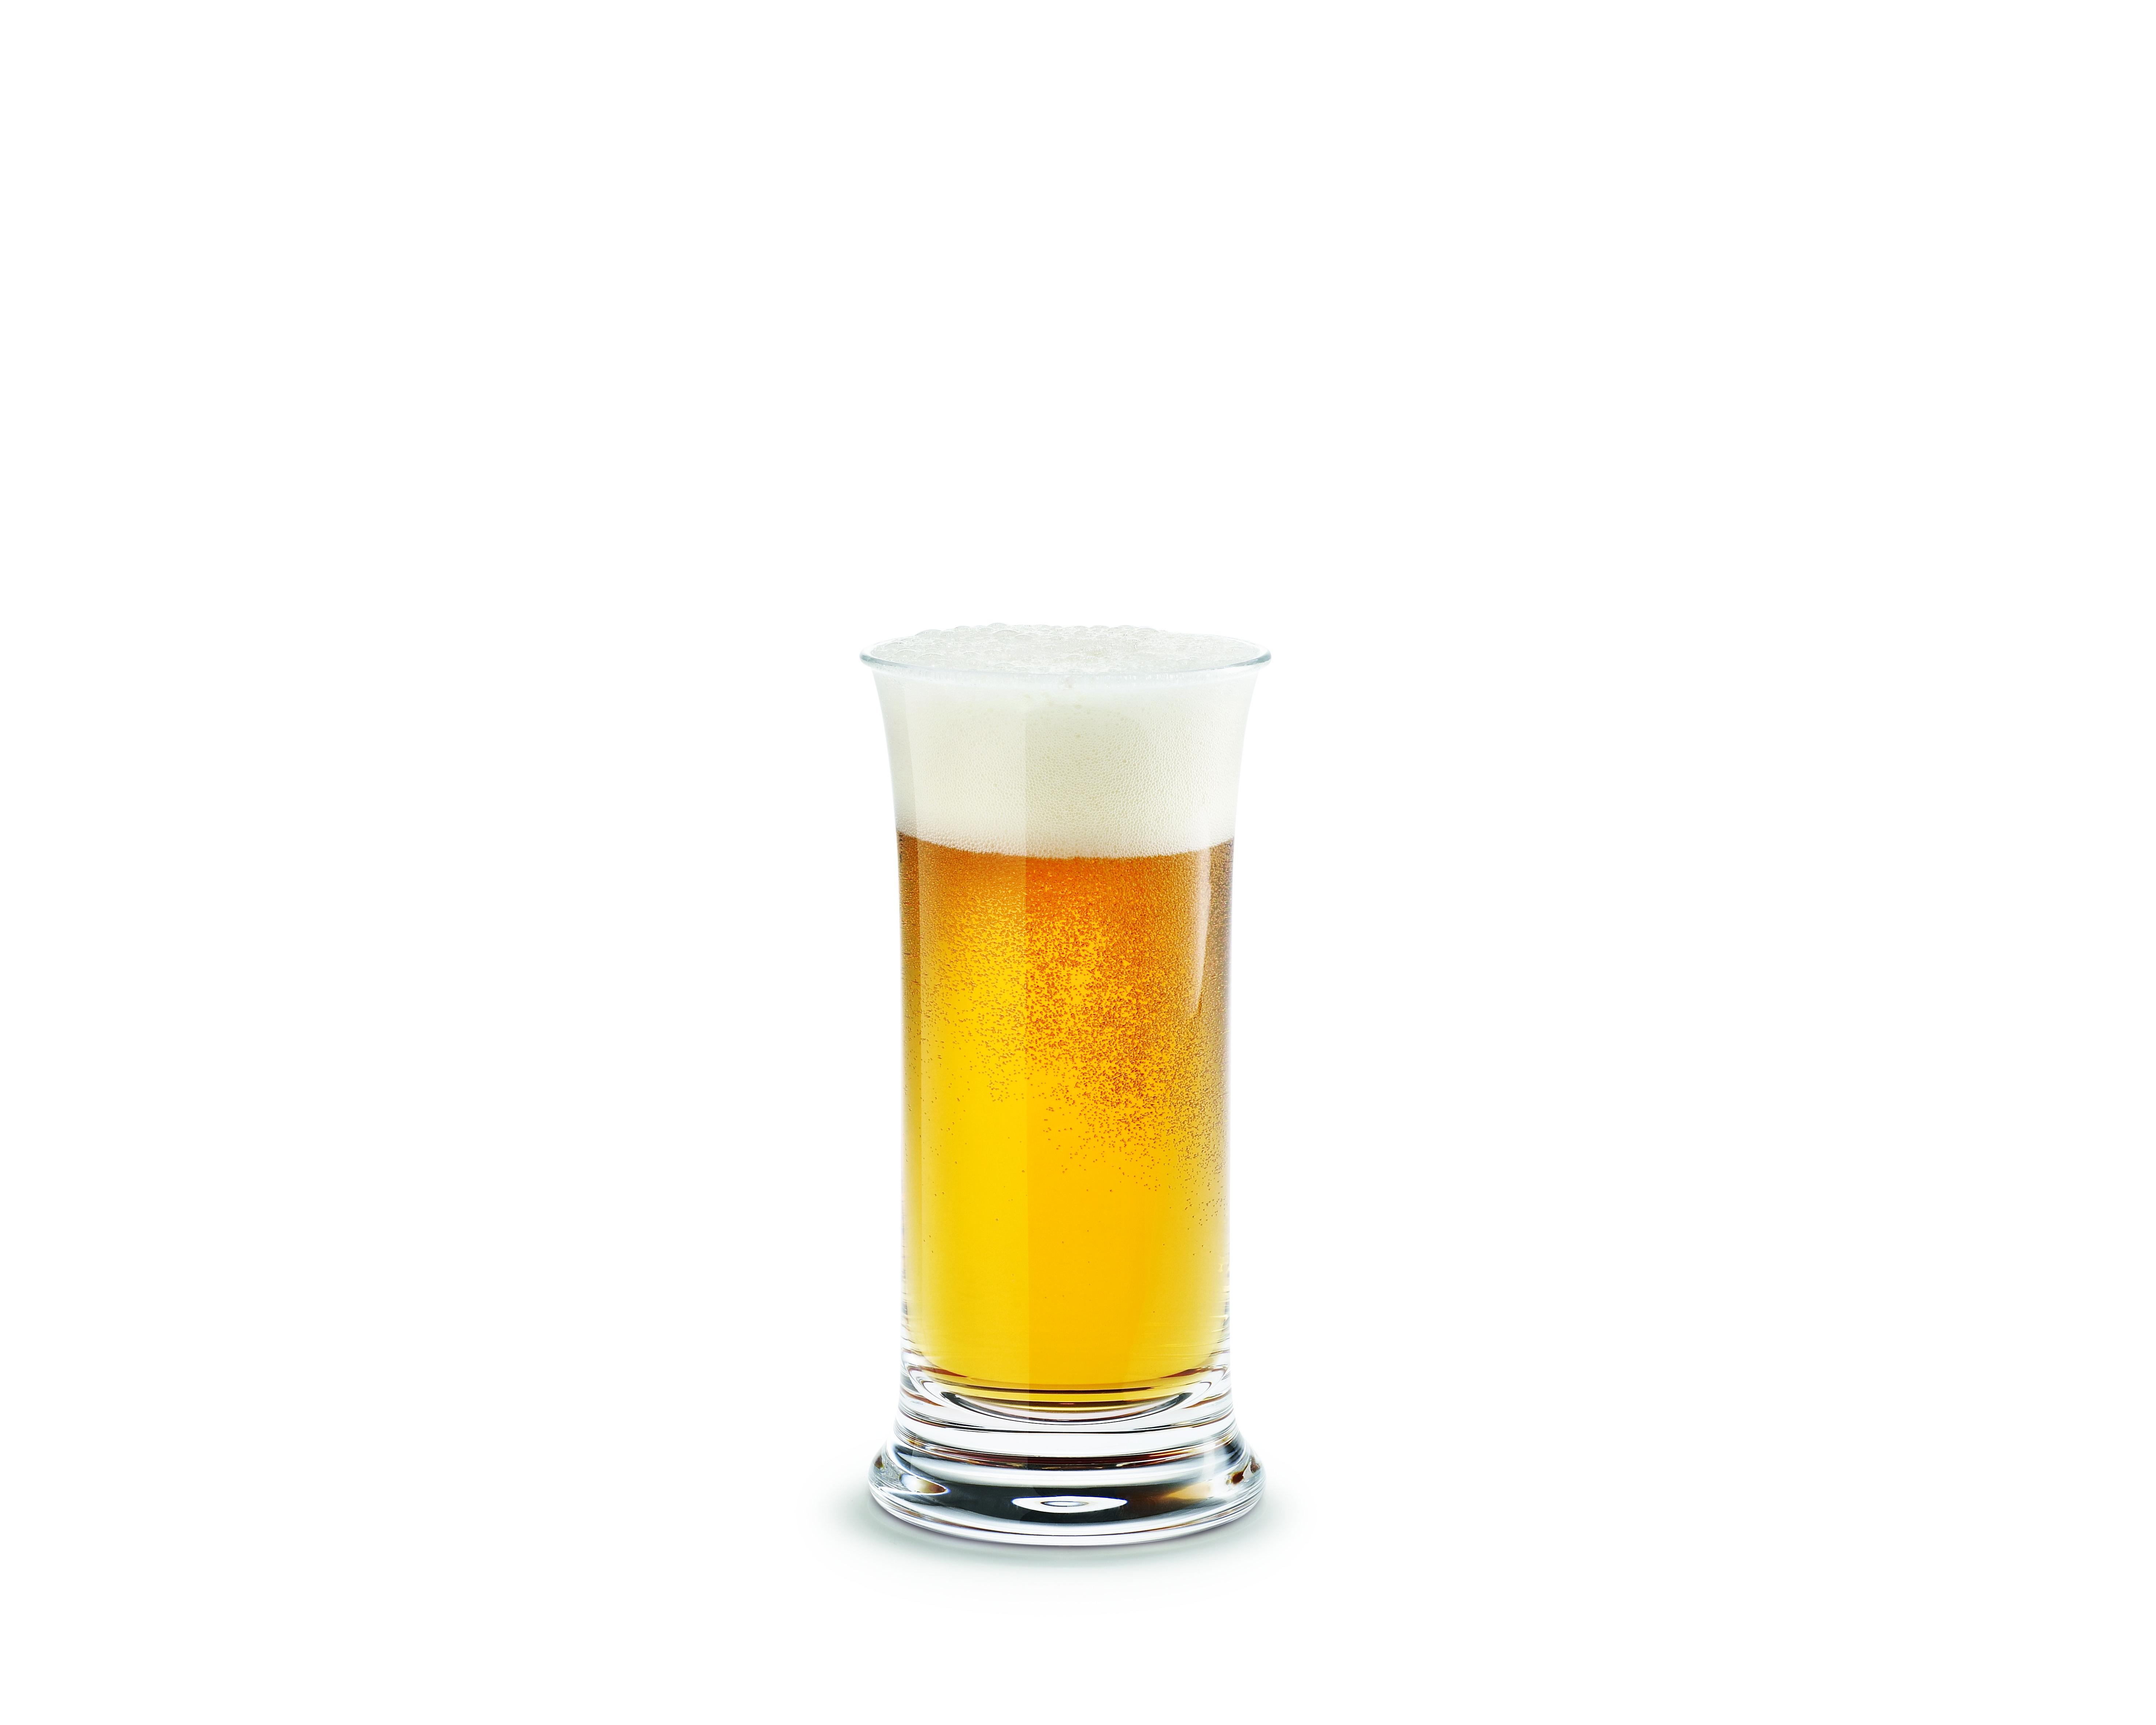 Holmegaard No. 5 ølglas, 300 ml